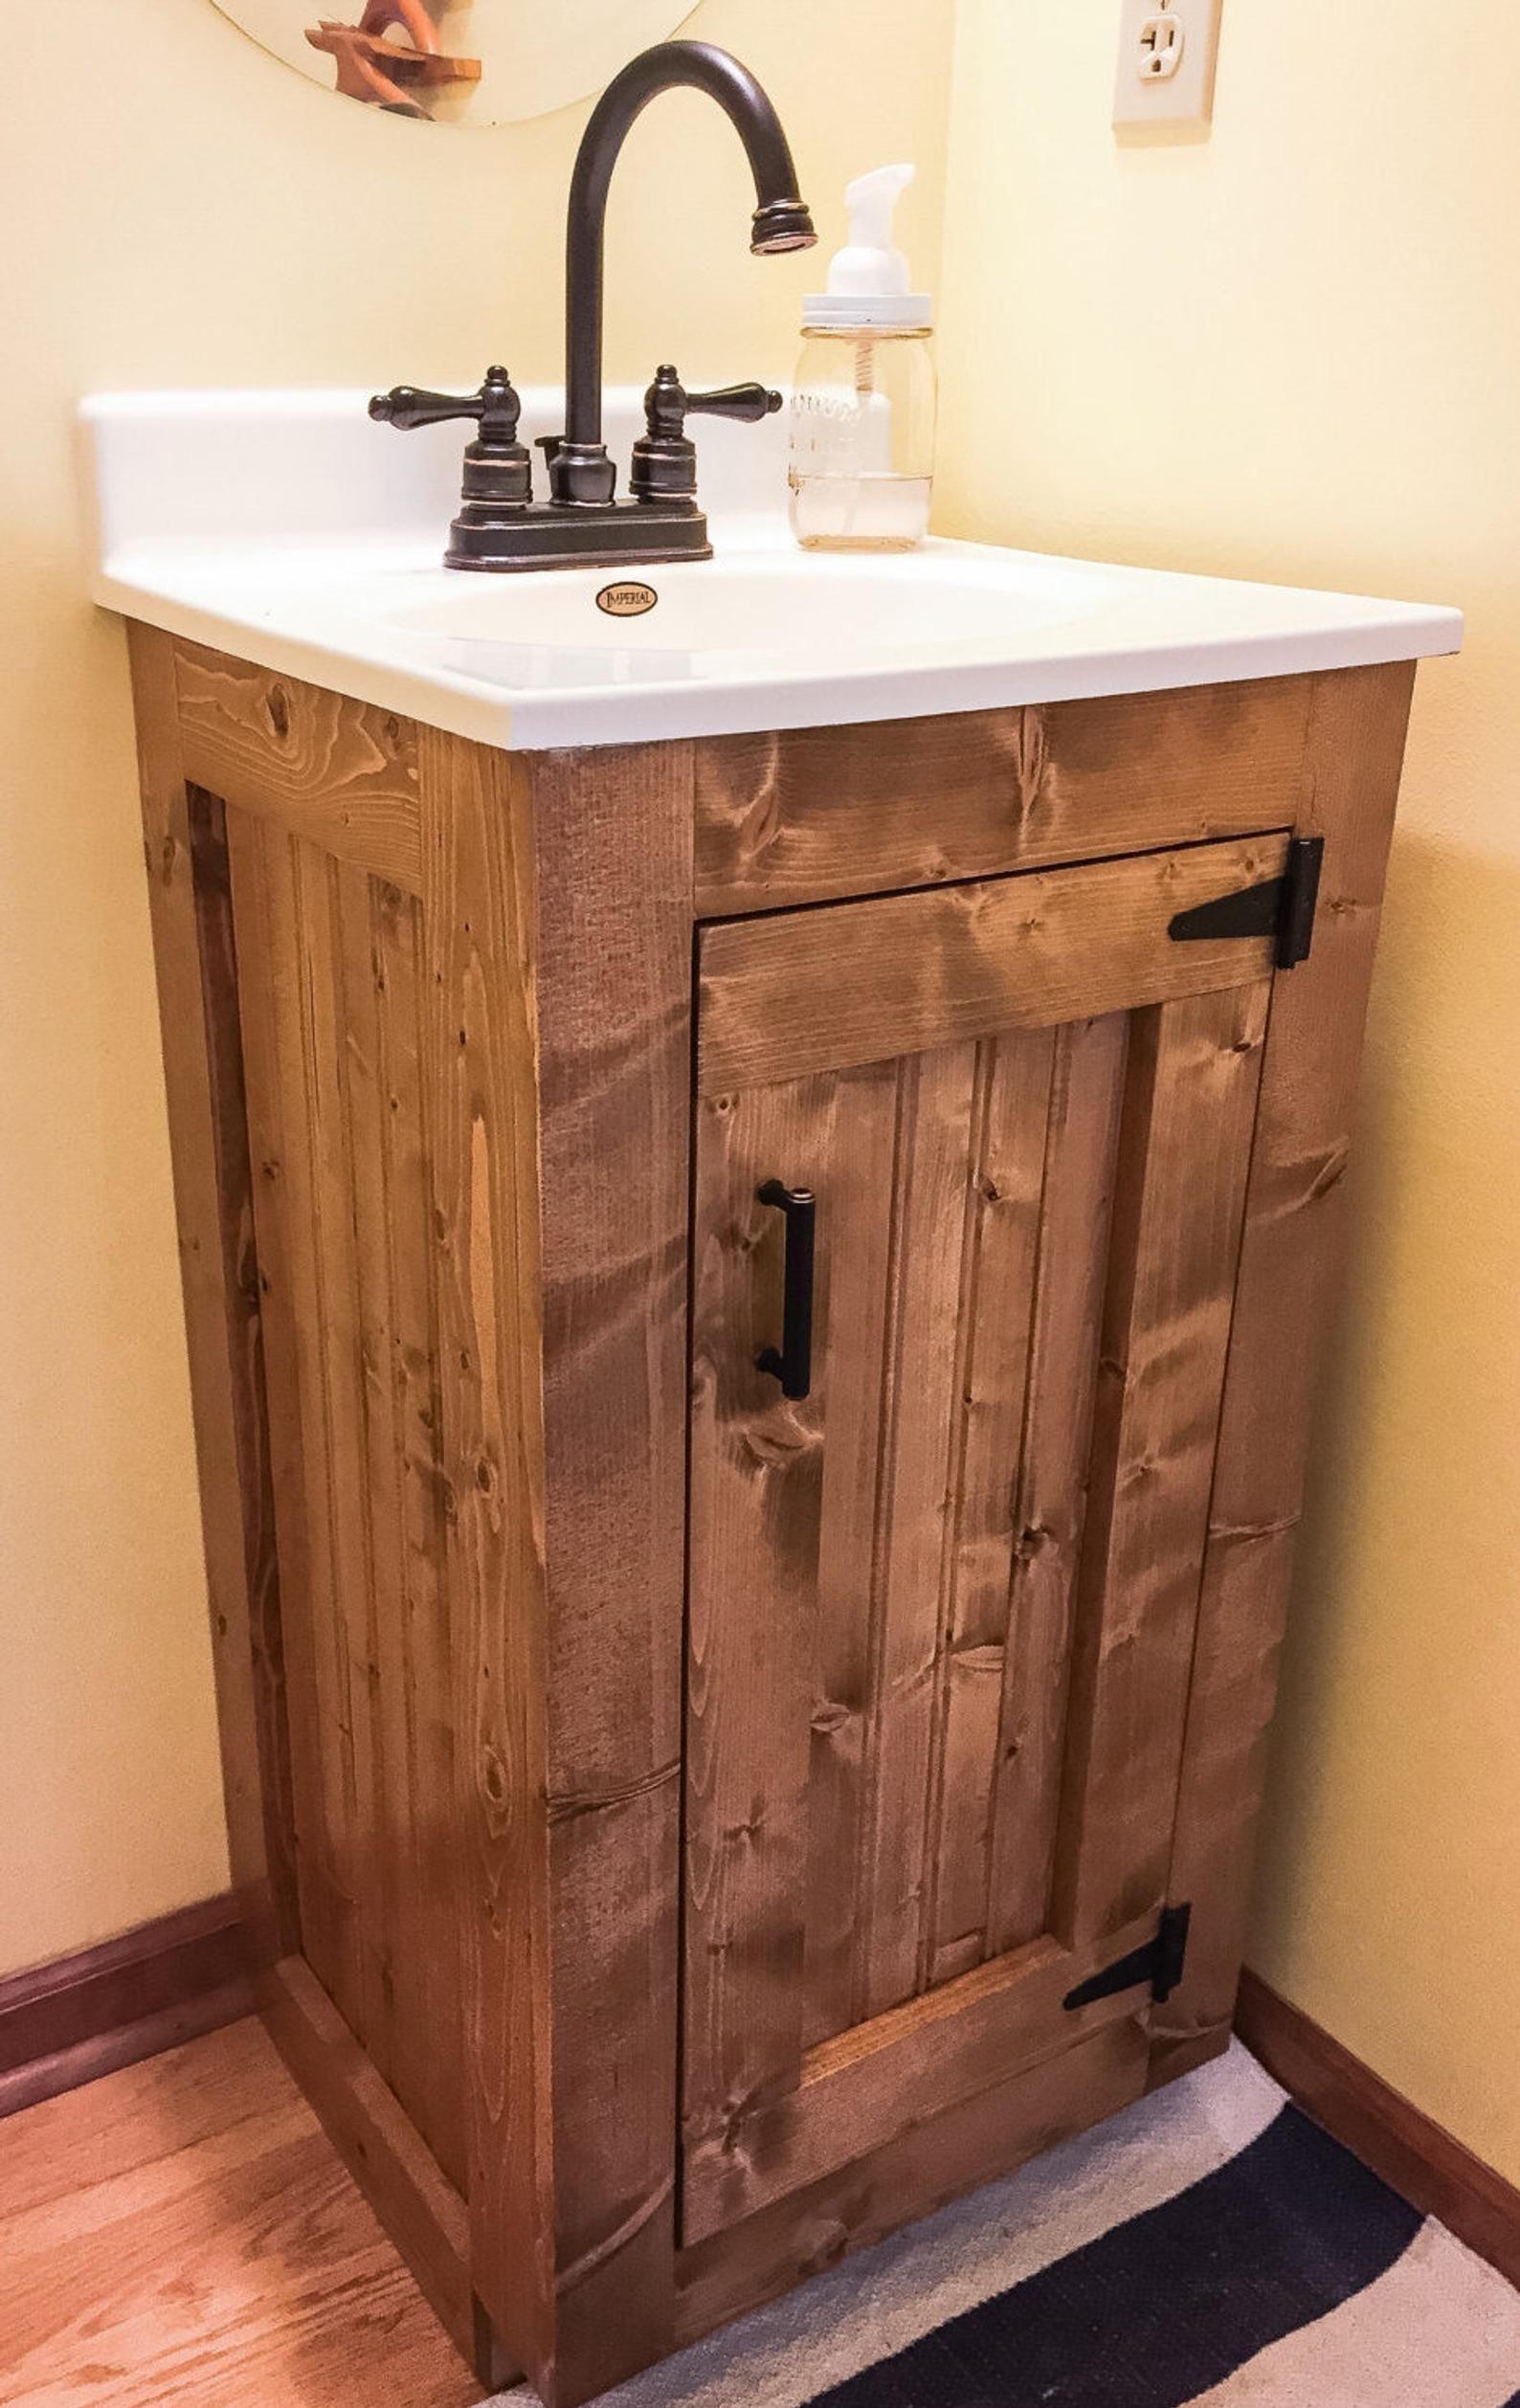 Bathroom Vanity Rustic Small Wood Cabinet With New England Etsy Bathroomdesign Standards Rustic Bathroom Vanities Country Bathroom Vanities Country Bathroom